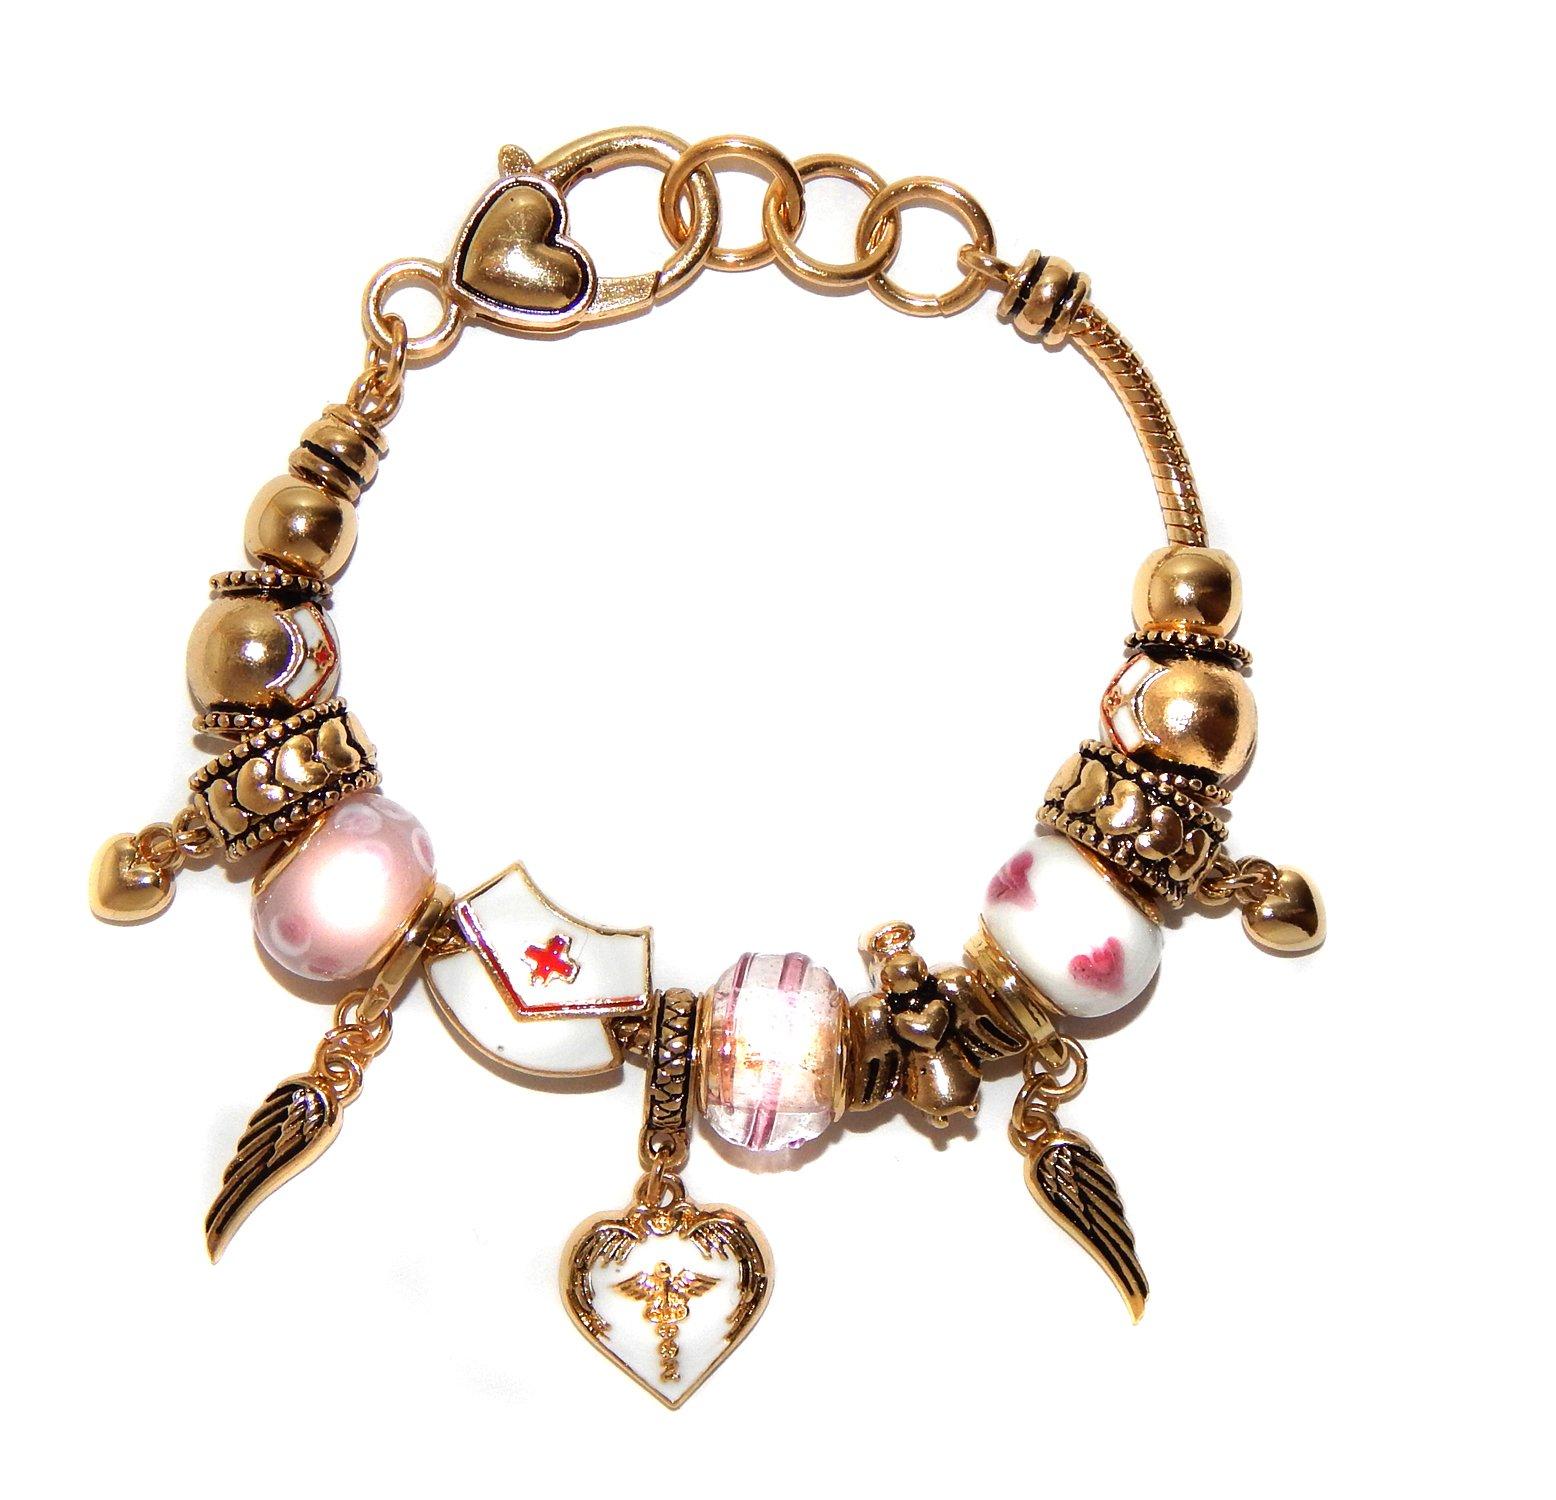 Landau Ambrosia Nurse Theme Charm Bracelet